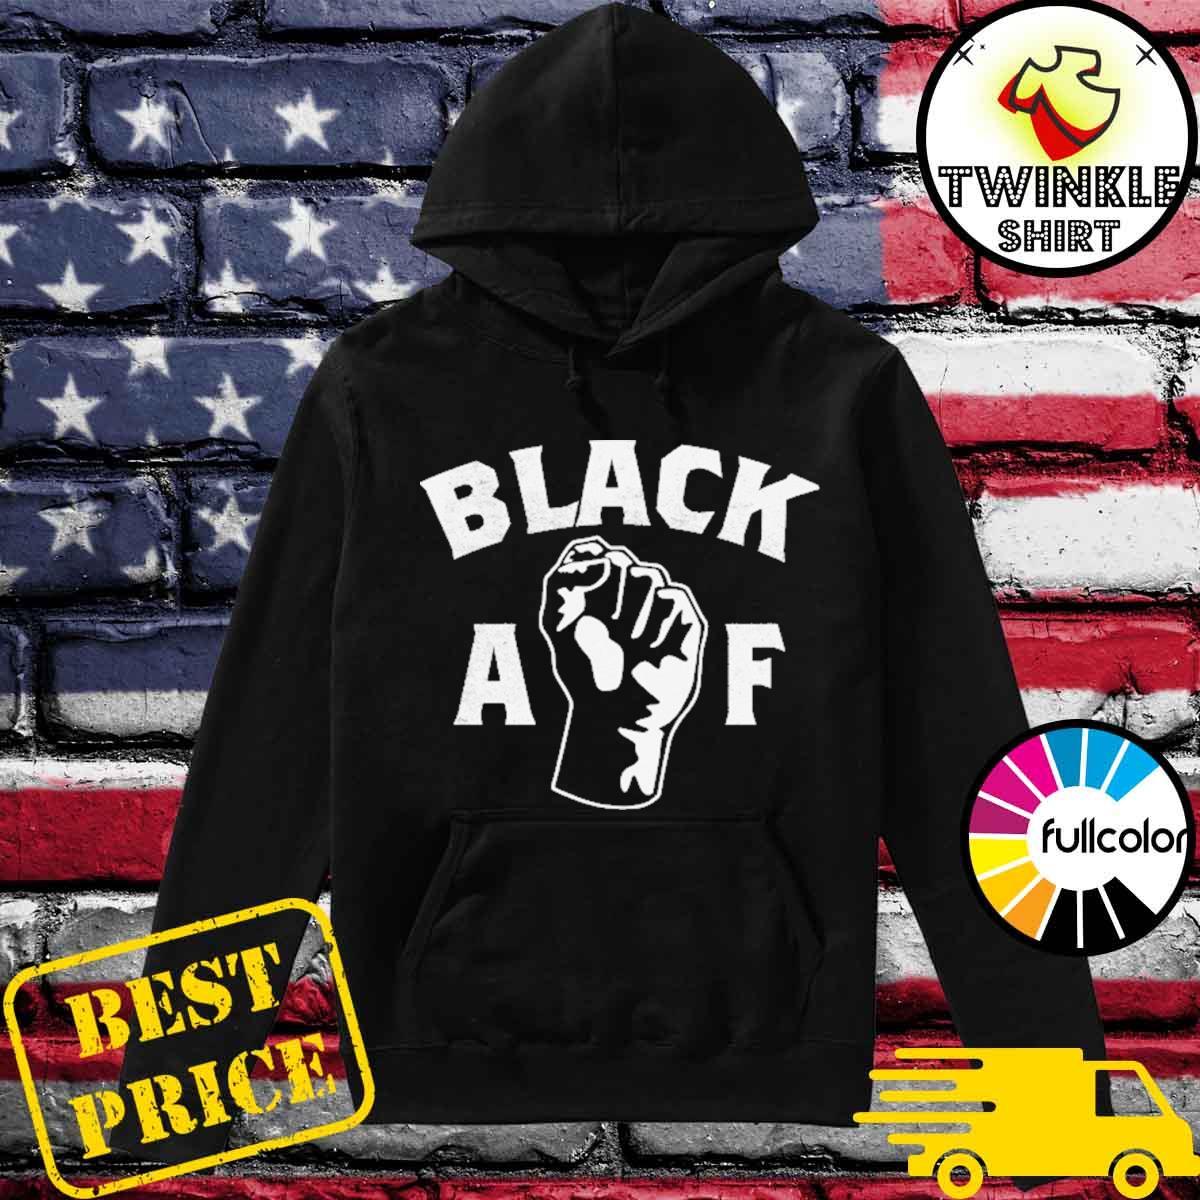 Official Black AF - Proud Black AF Pro Black Pride Proud Hoodie